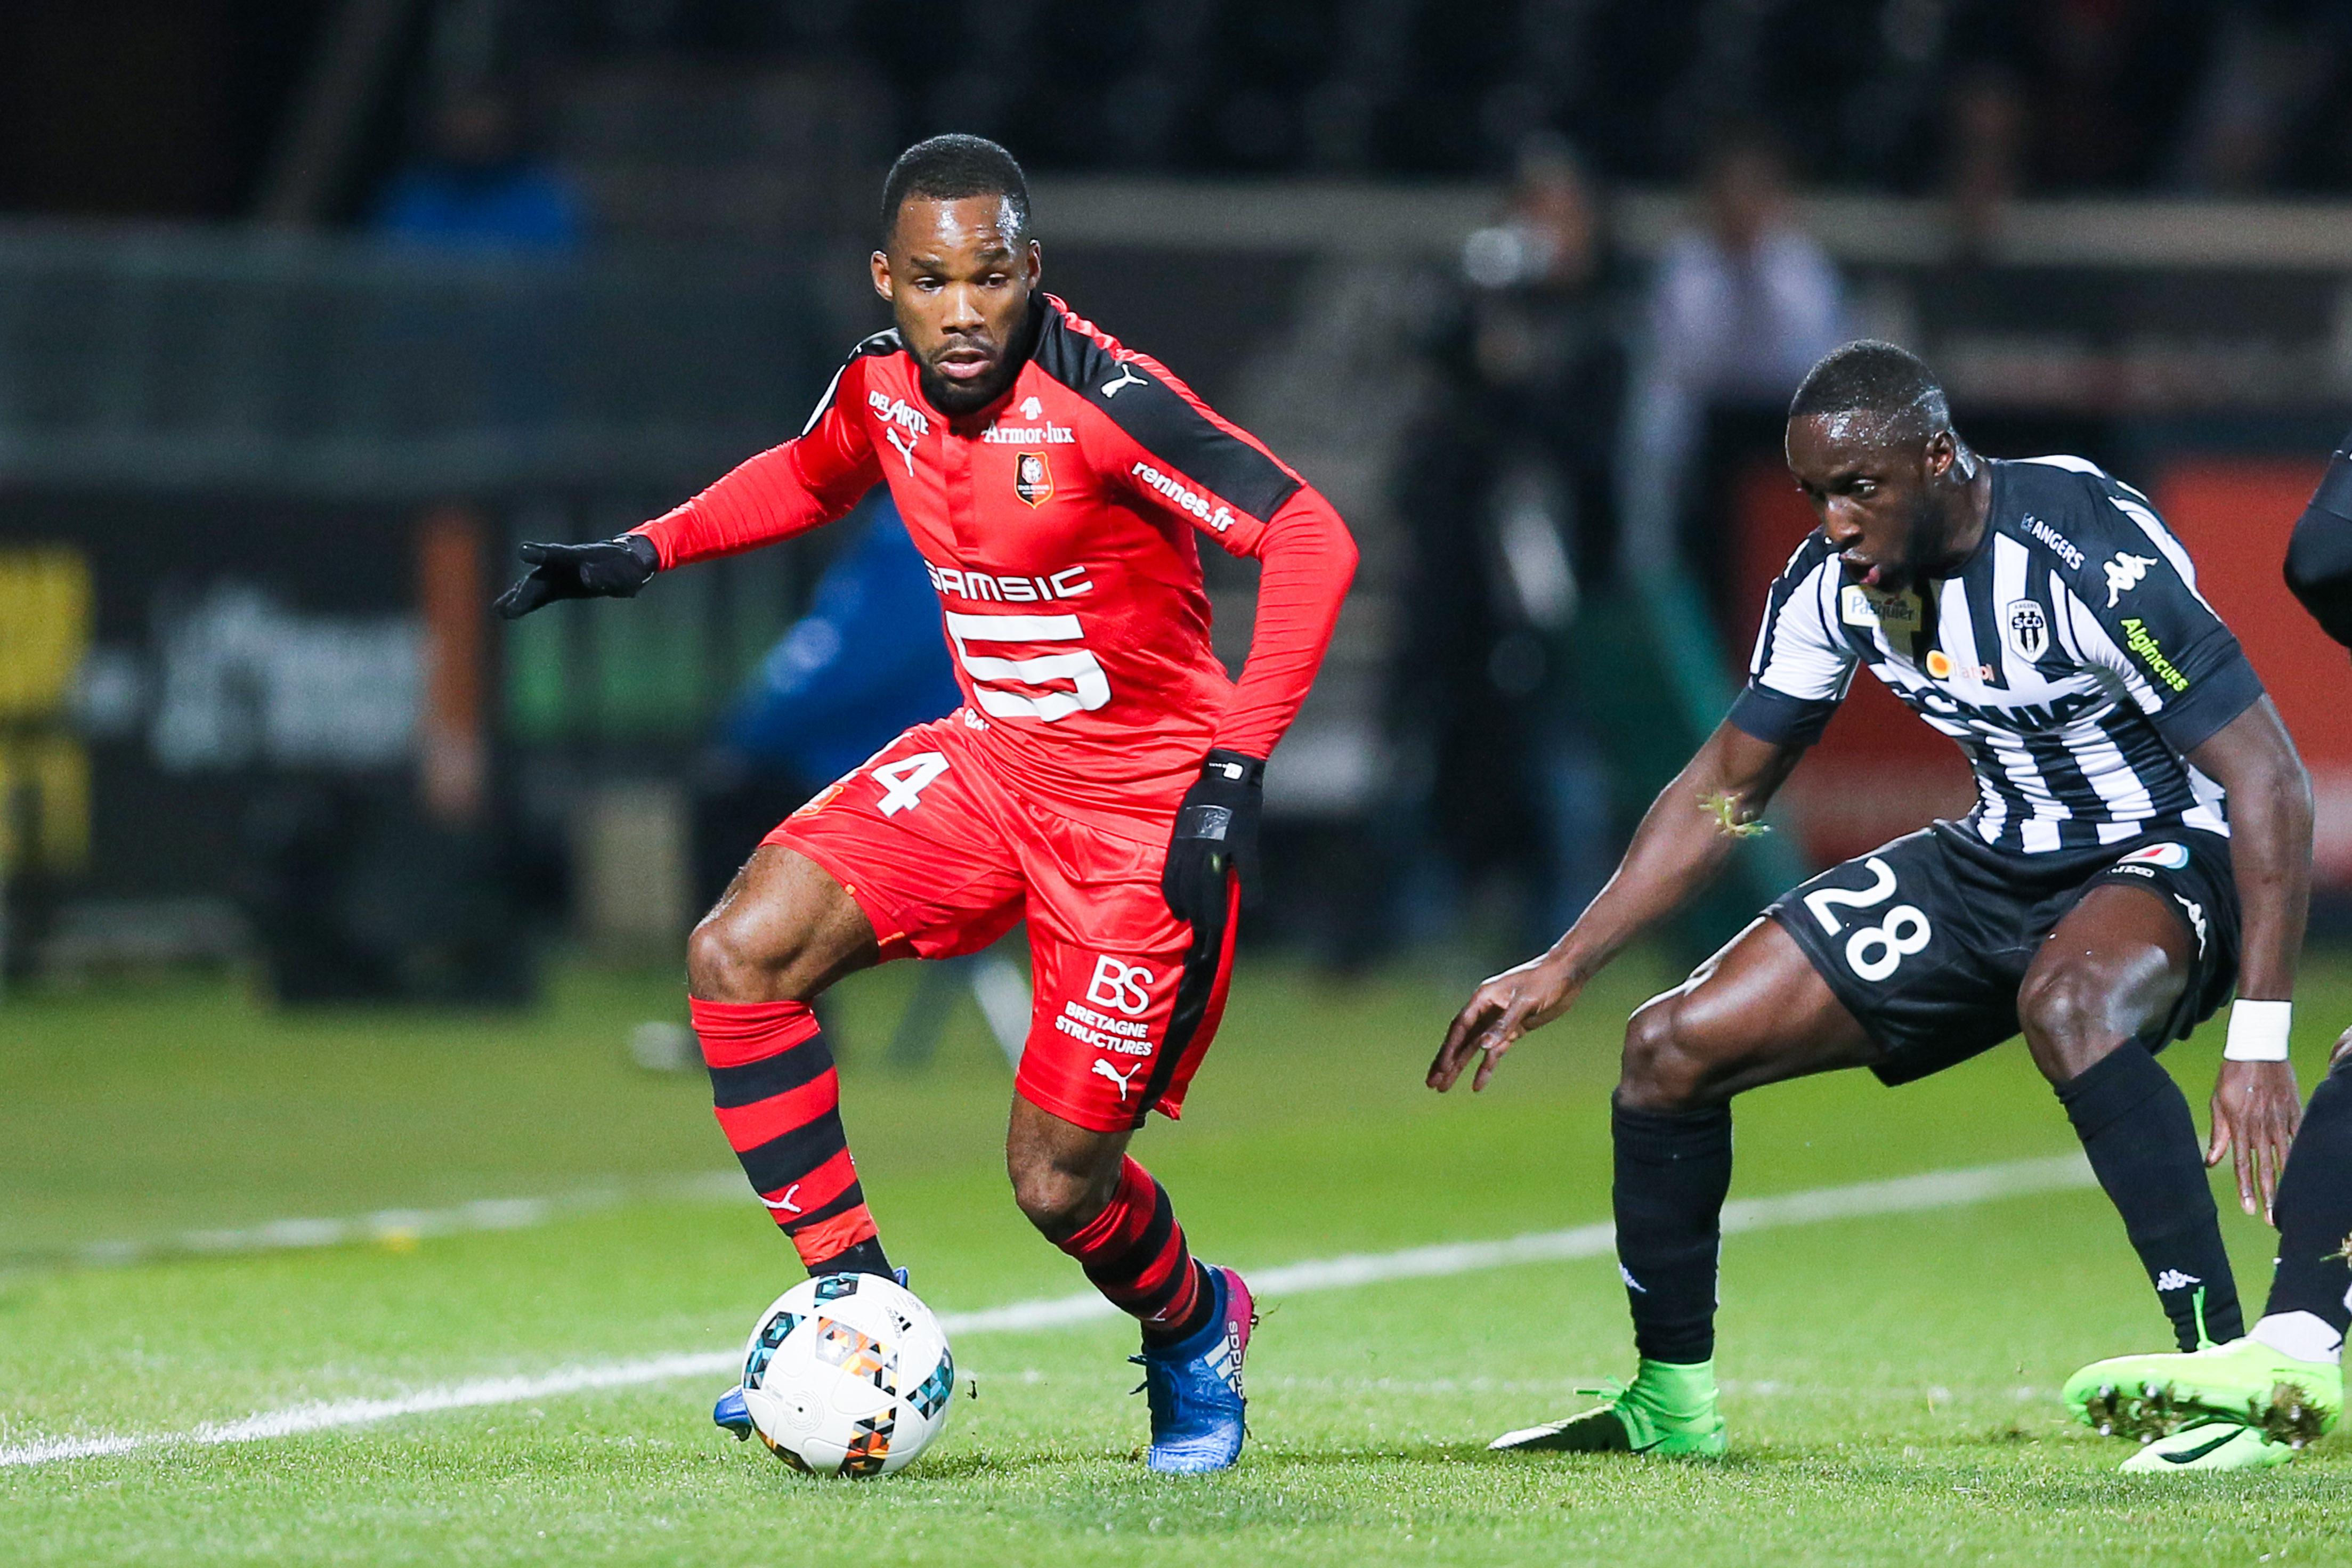 Angers SCO v Stade Rennes - Ligue 1